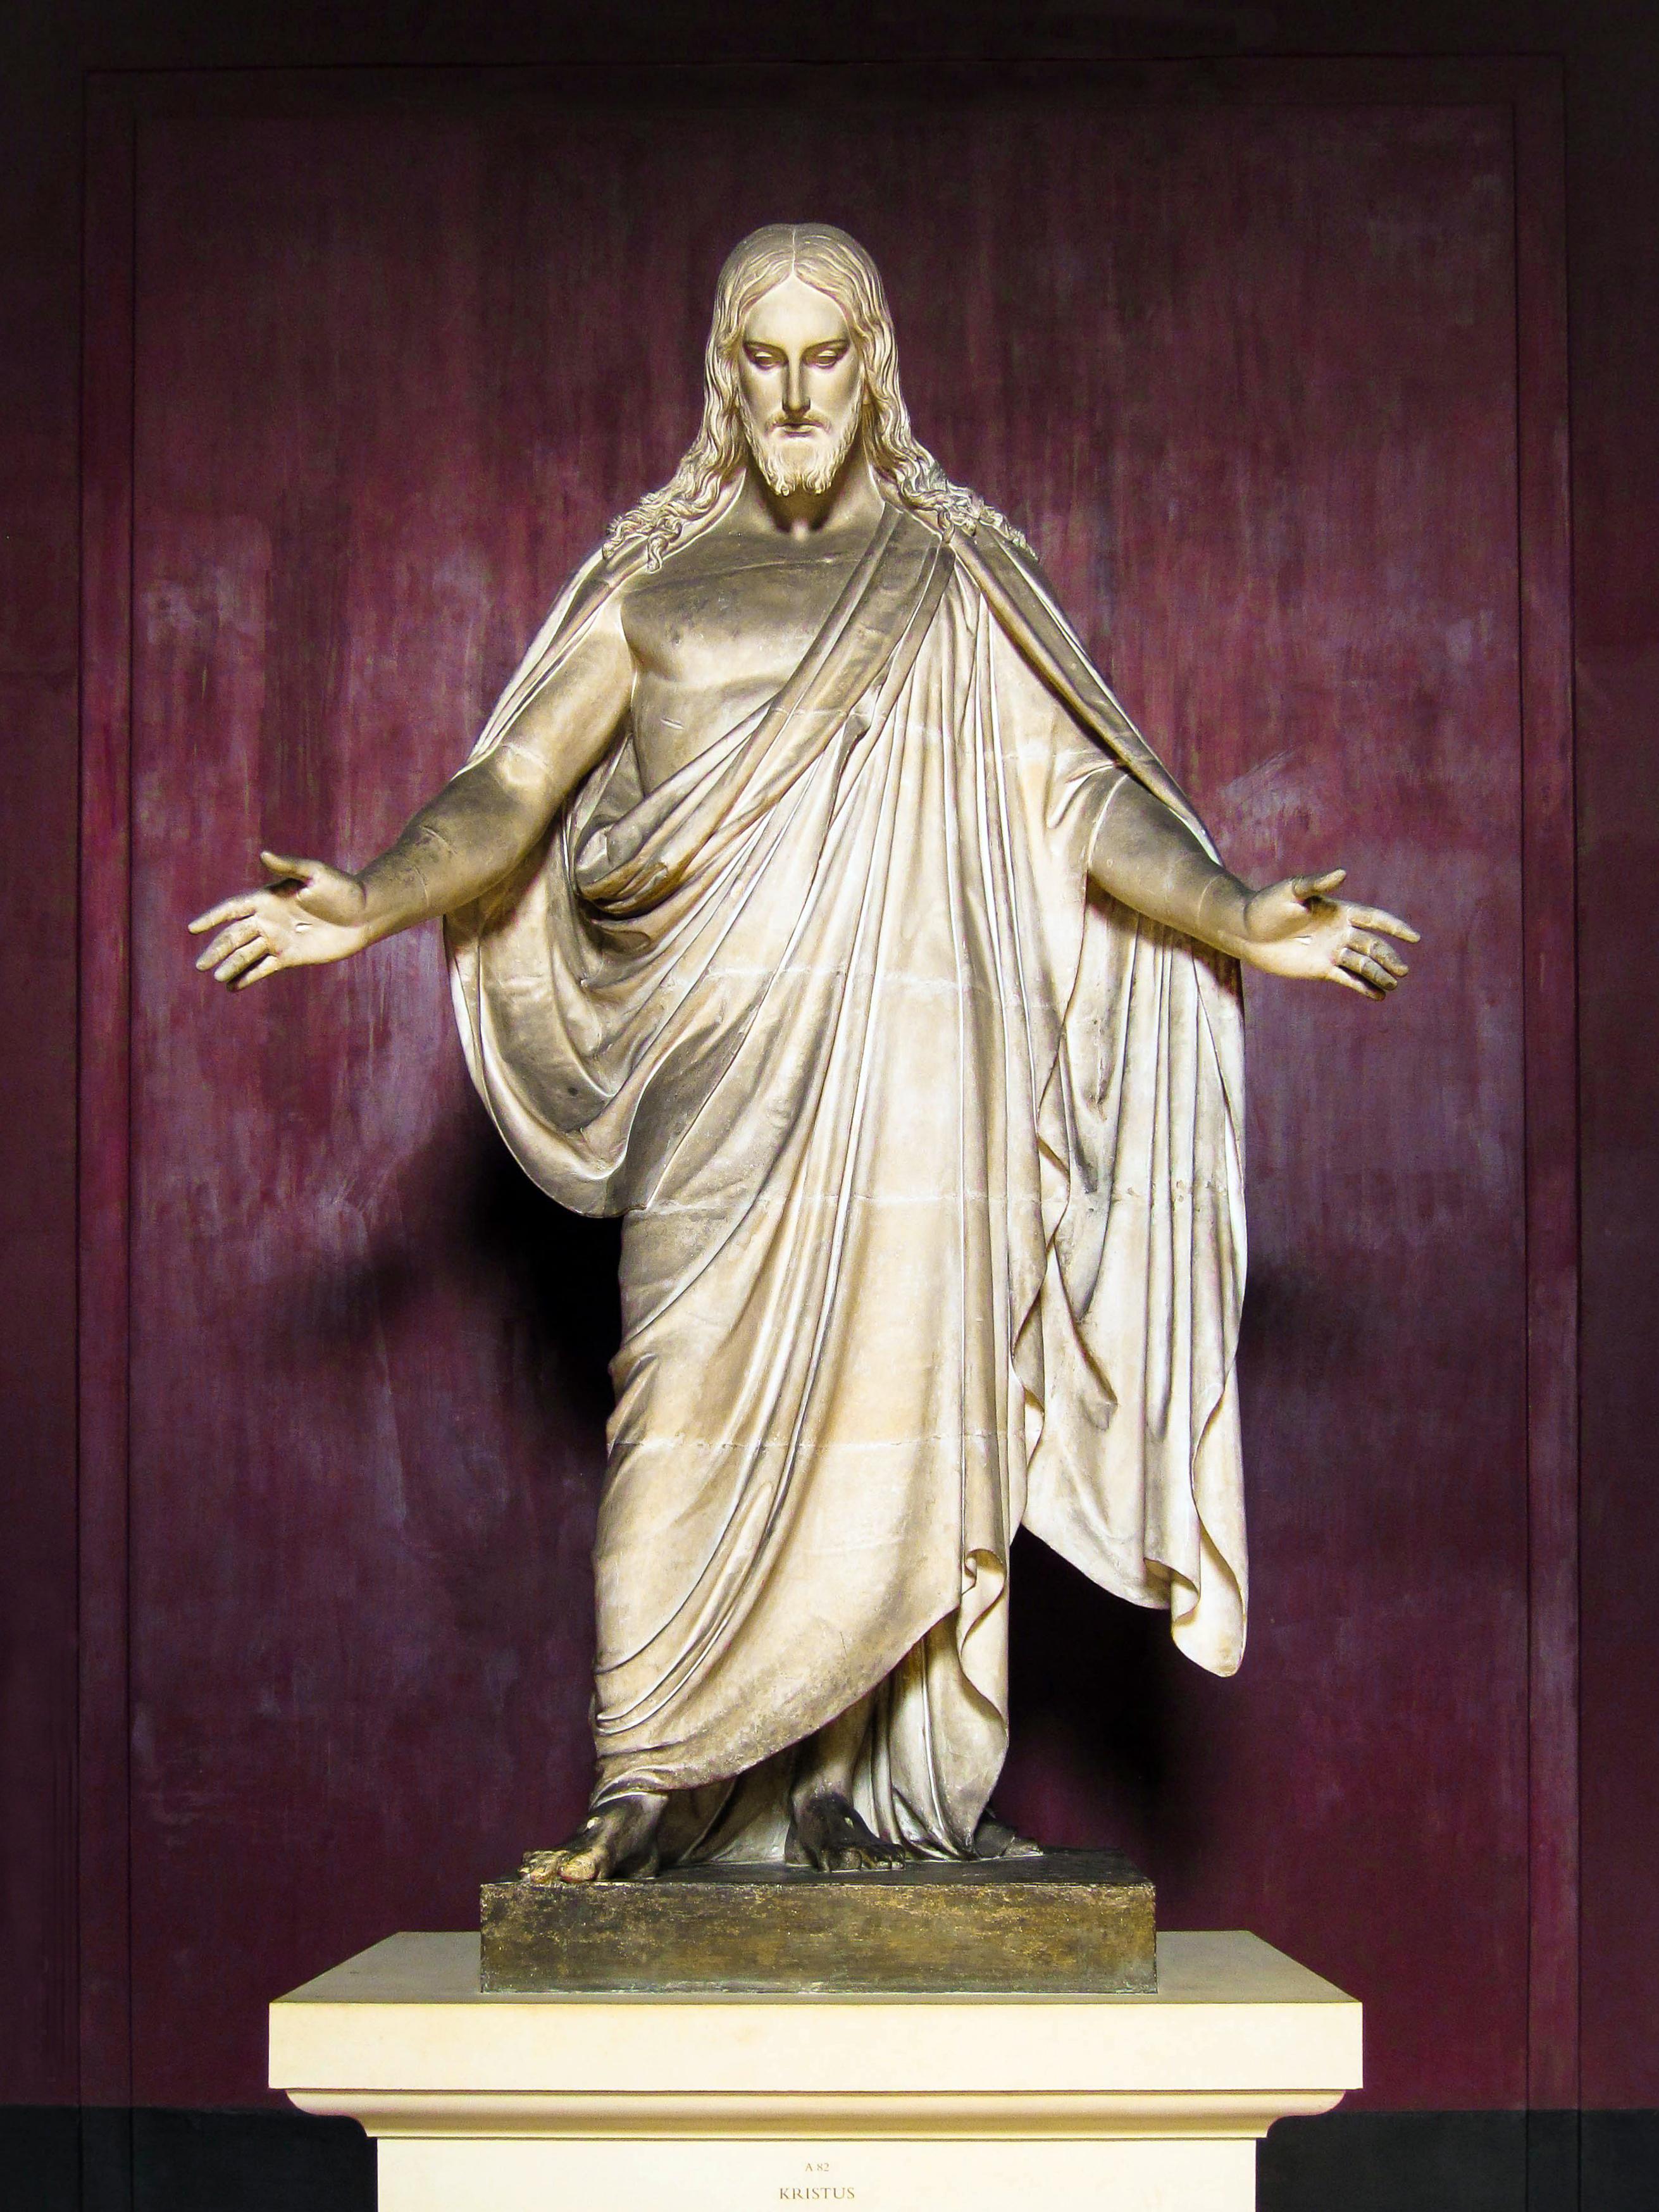 File:Christus (Draft) by Thorvaldsen jpg - Wikimedia Commons